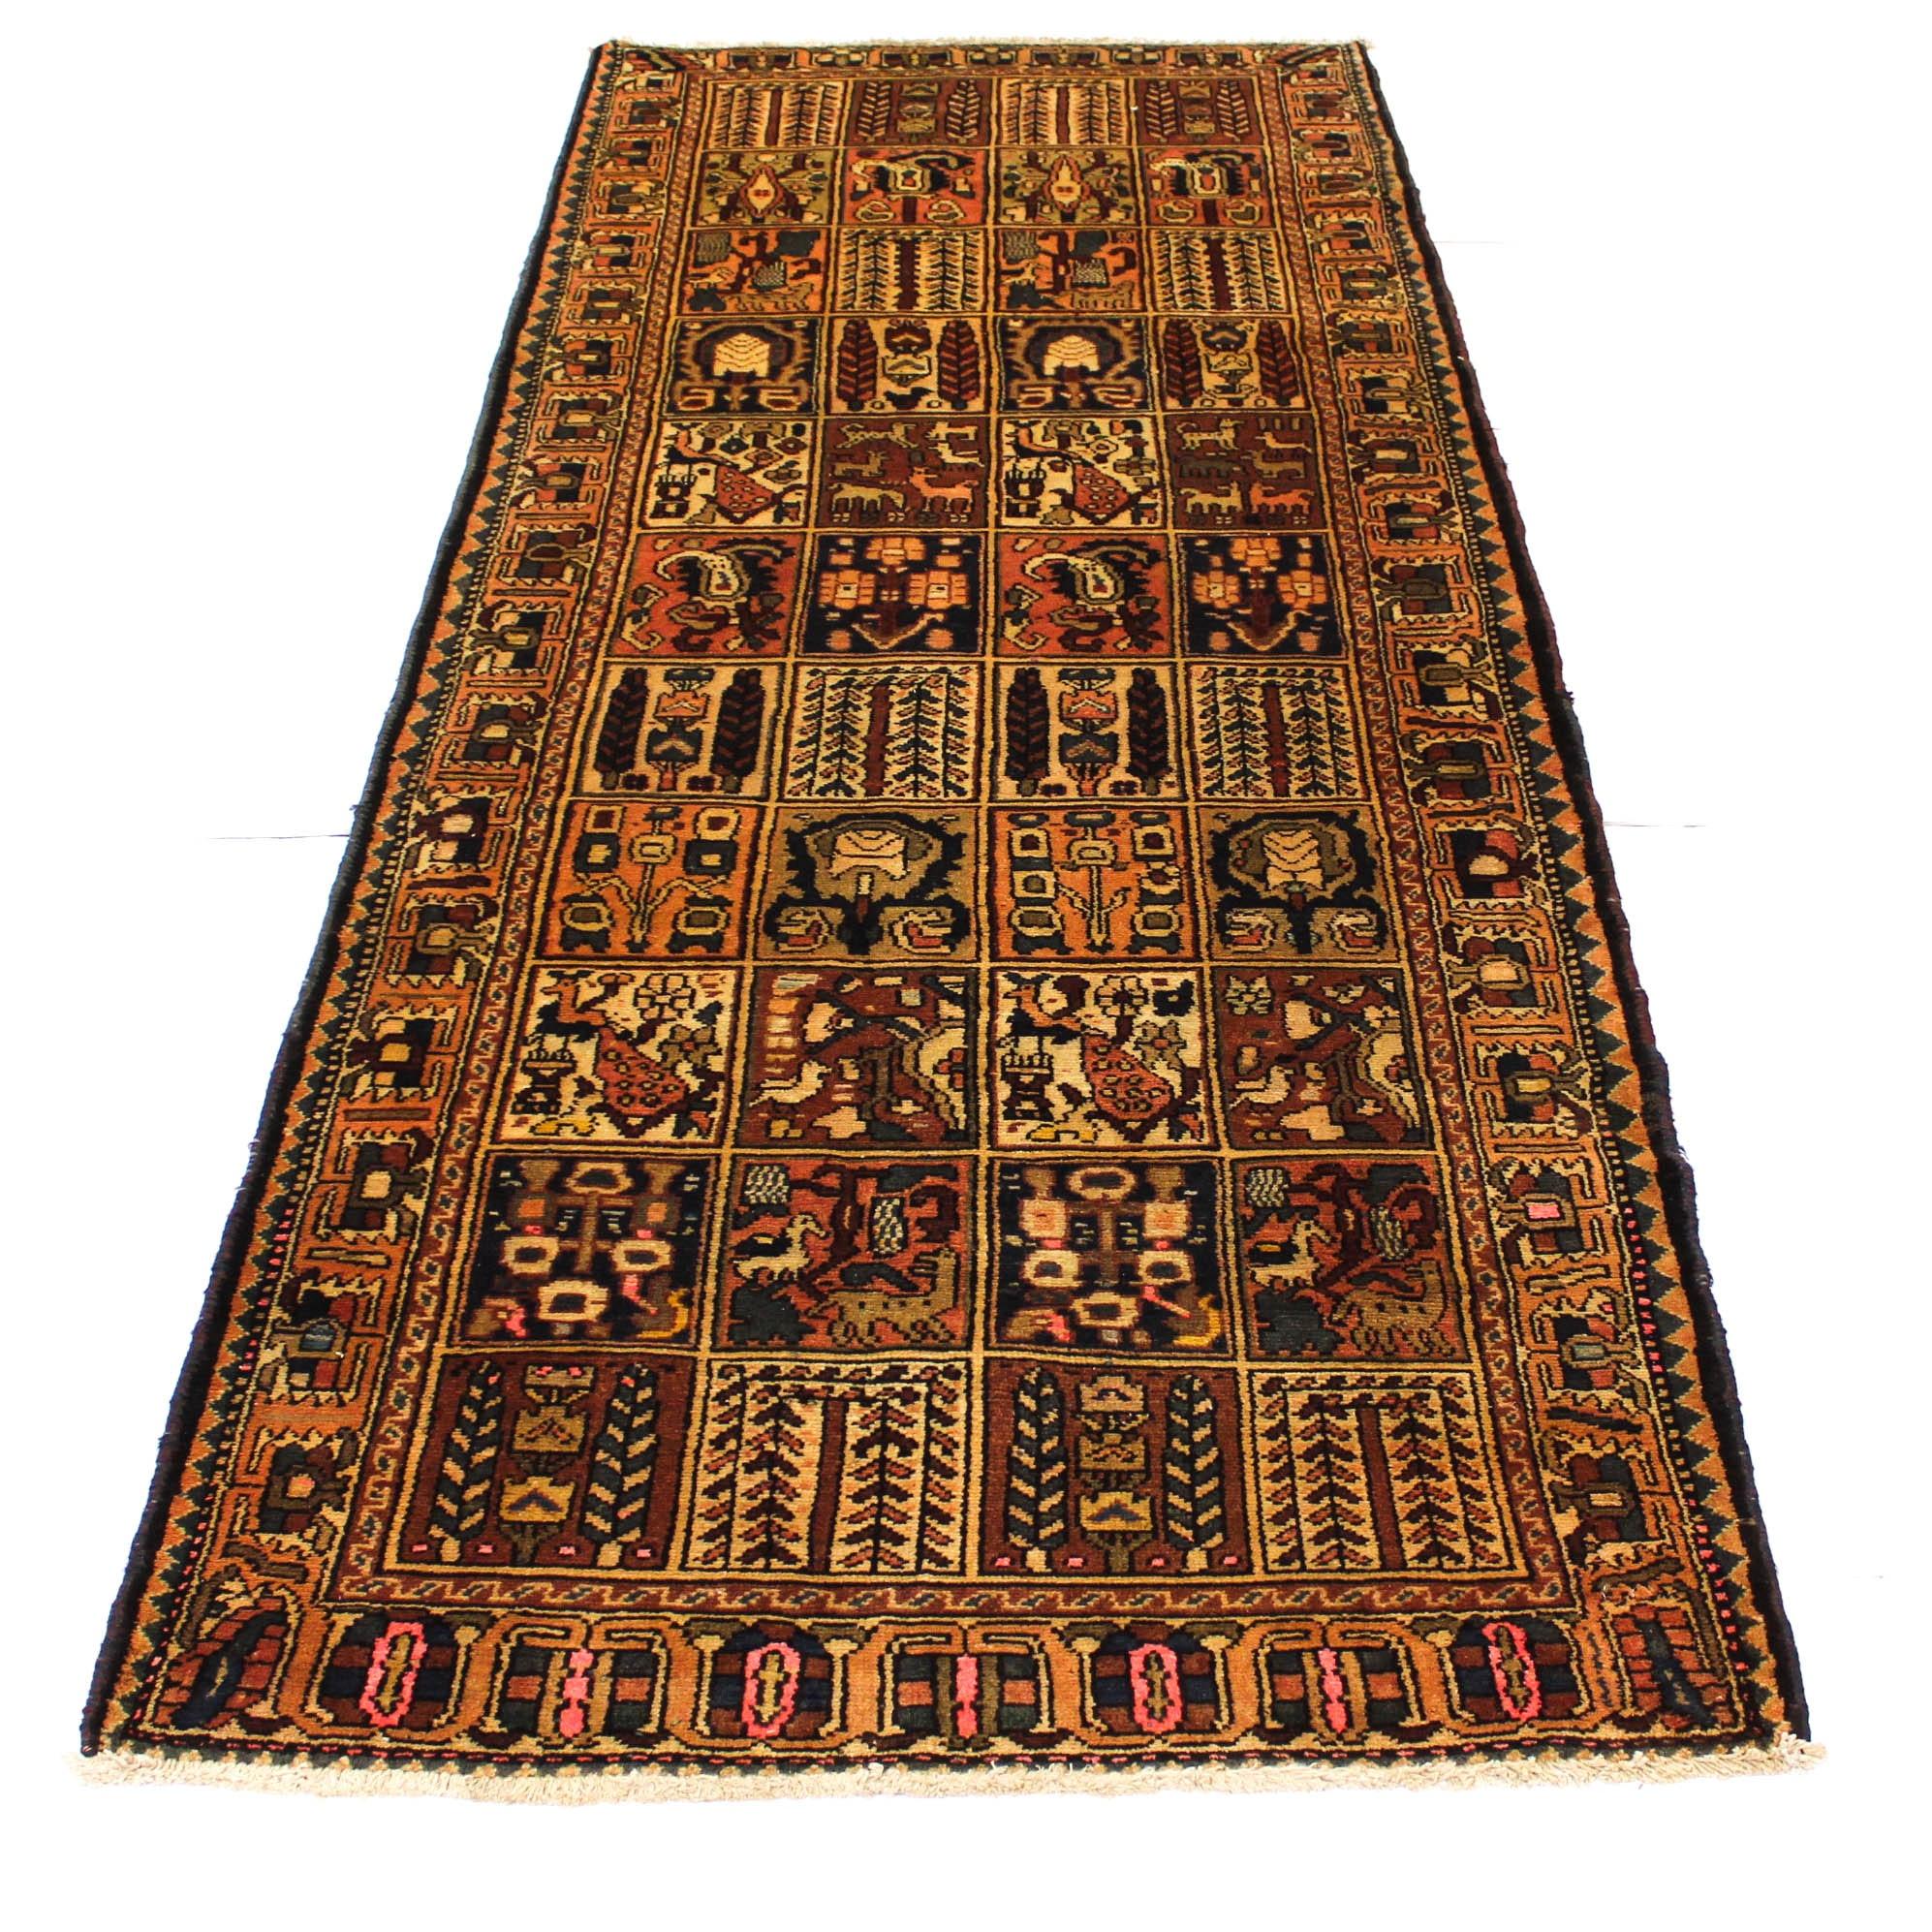 Vintage Hand-Knotted Persian Bakhtiari Rug